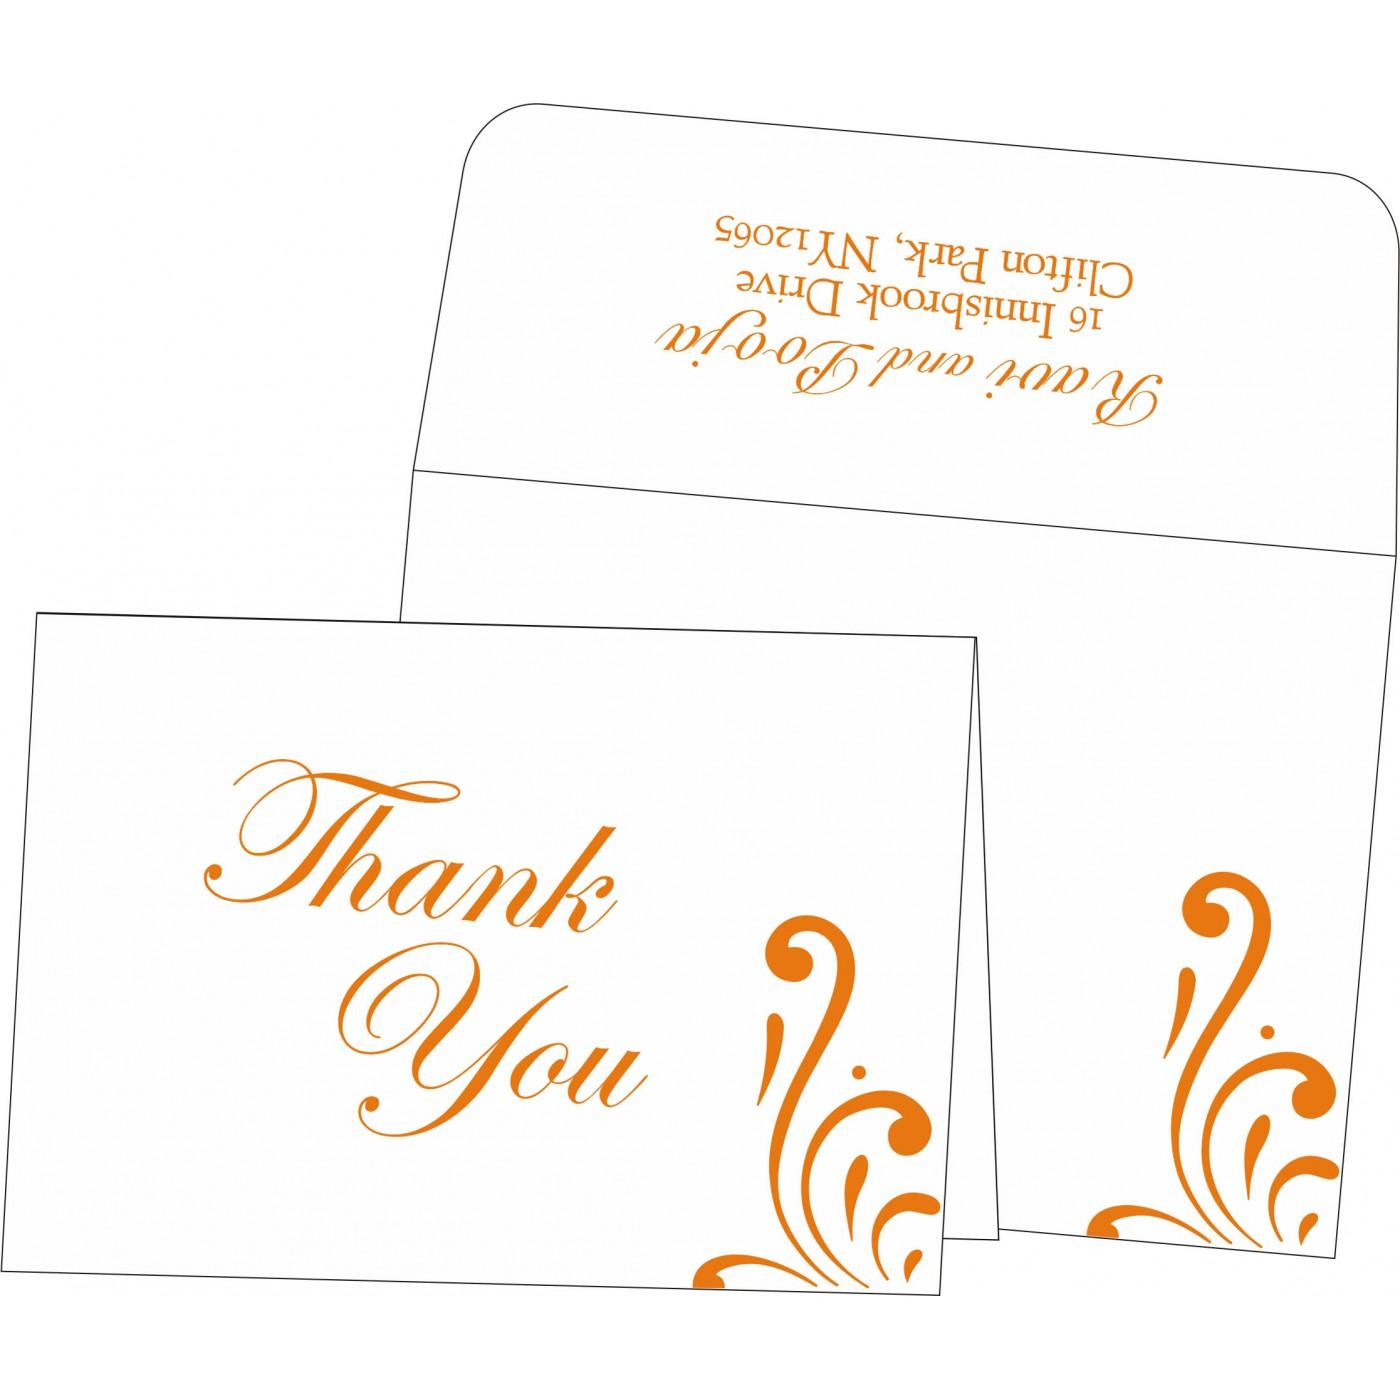 Thank You Cards : TYC-8223K - 123WeddingCards